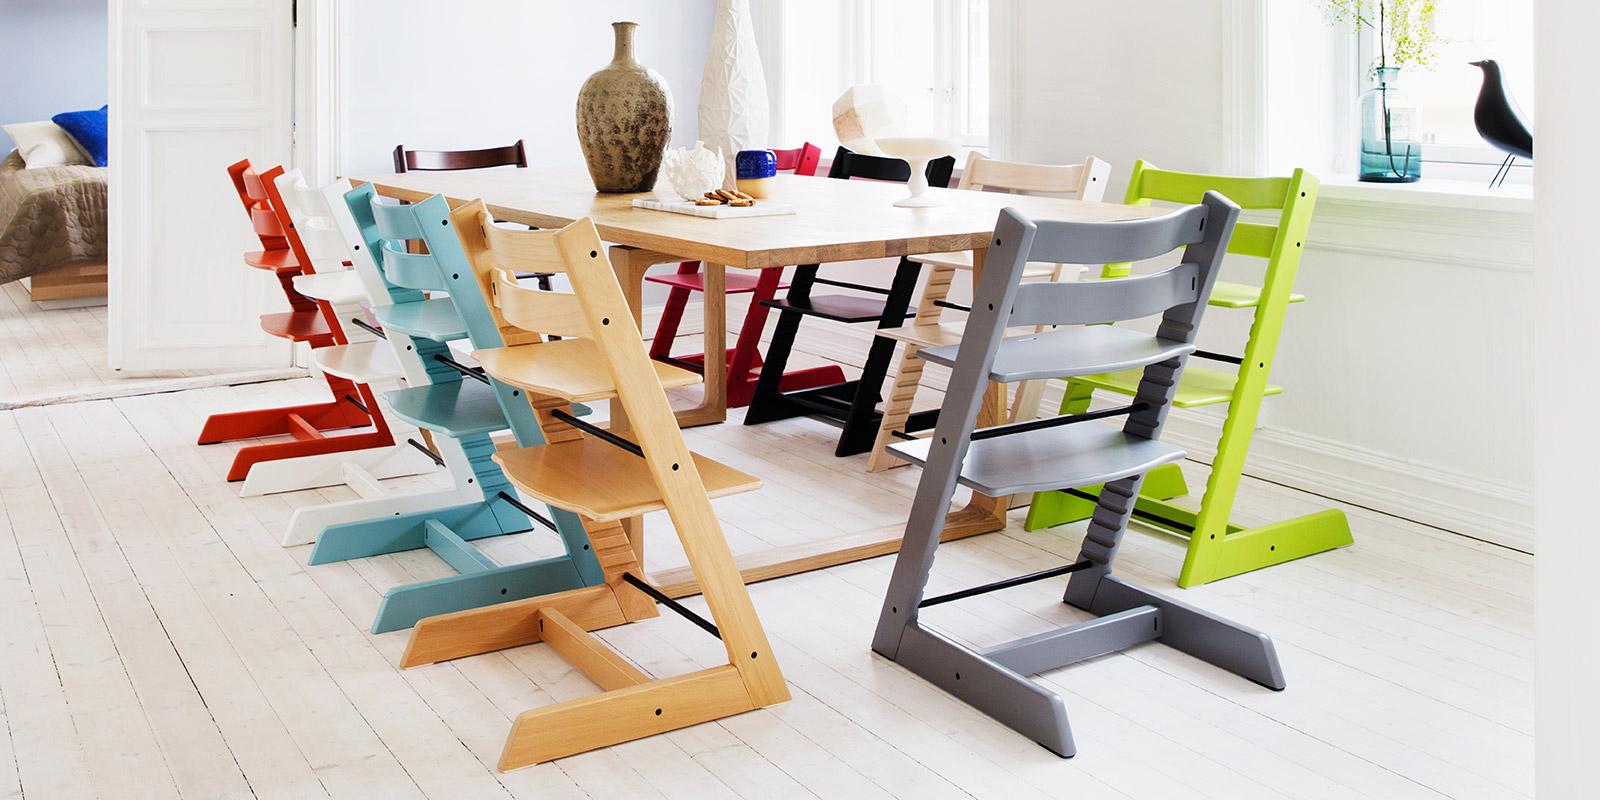 tripp trapp de stoel die met je kindje meegroeit nu. Black Bedroom Furniture Sets. Home Design Ideas